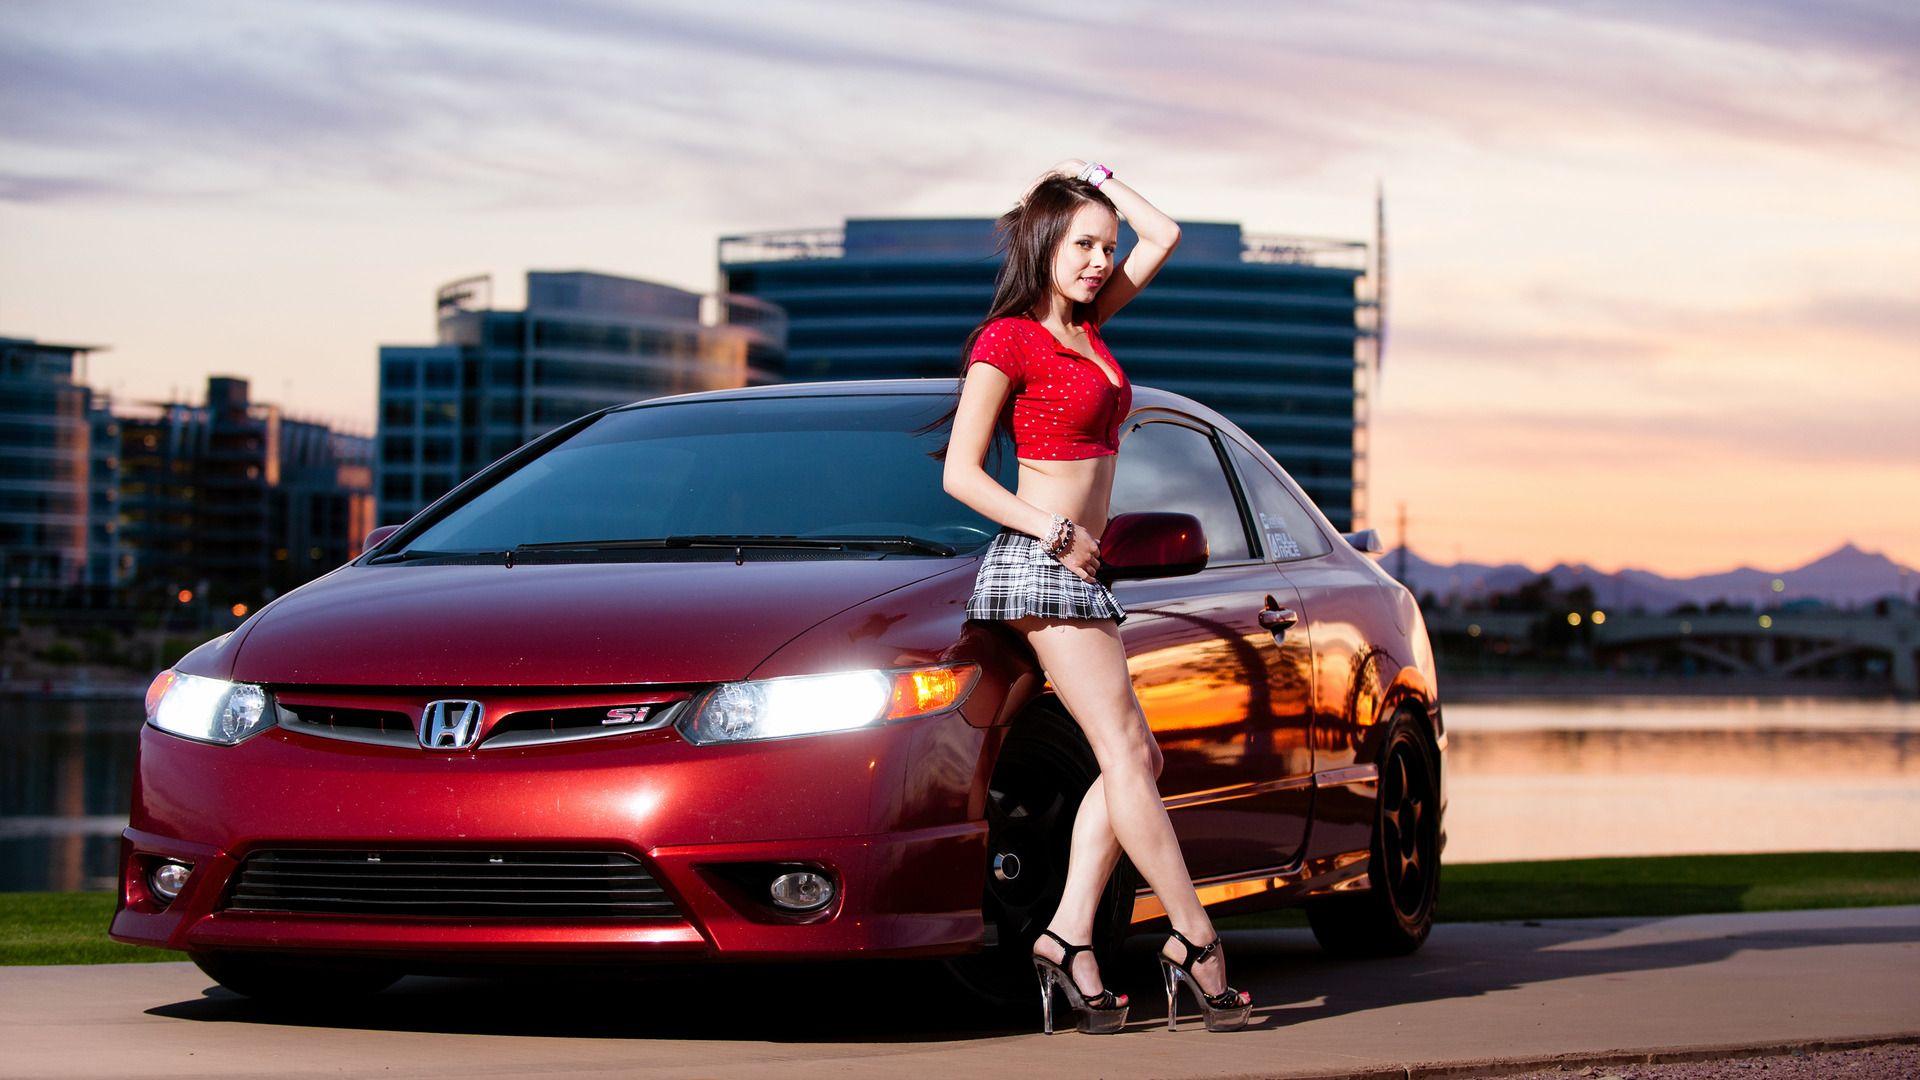 Car Girl 1080p